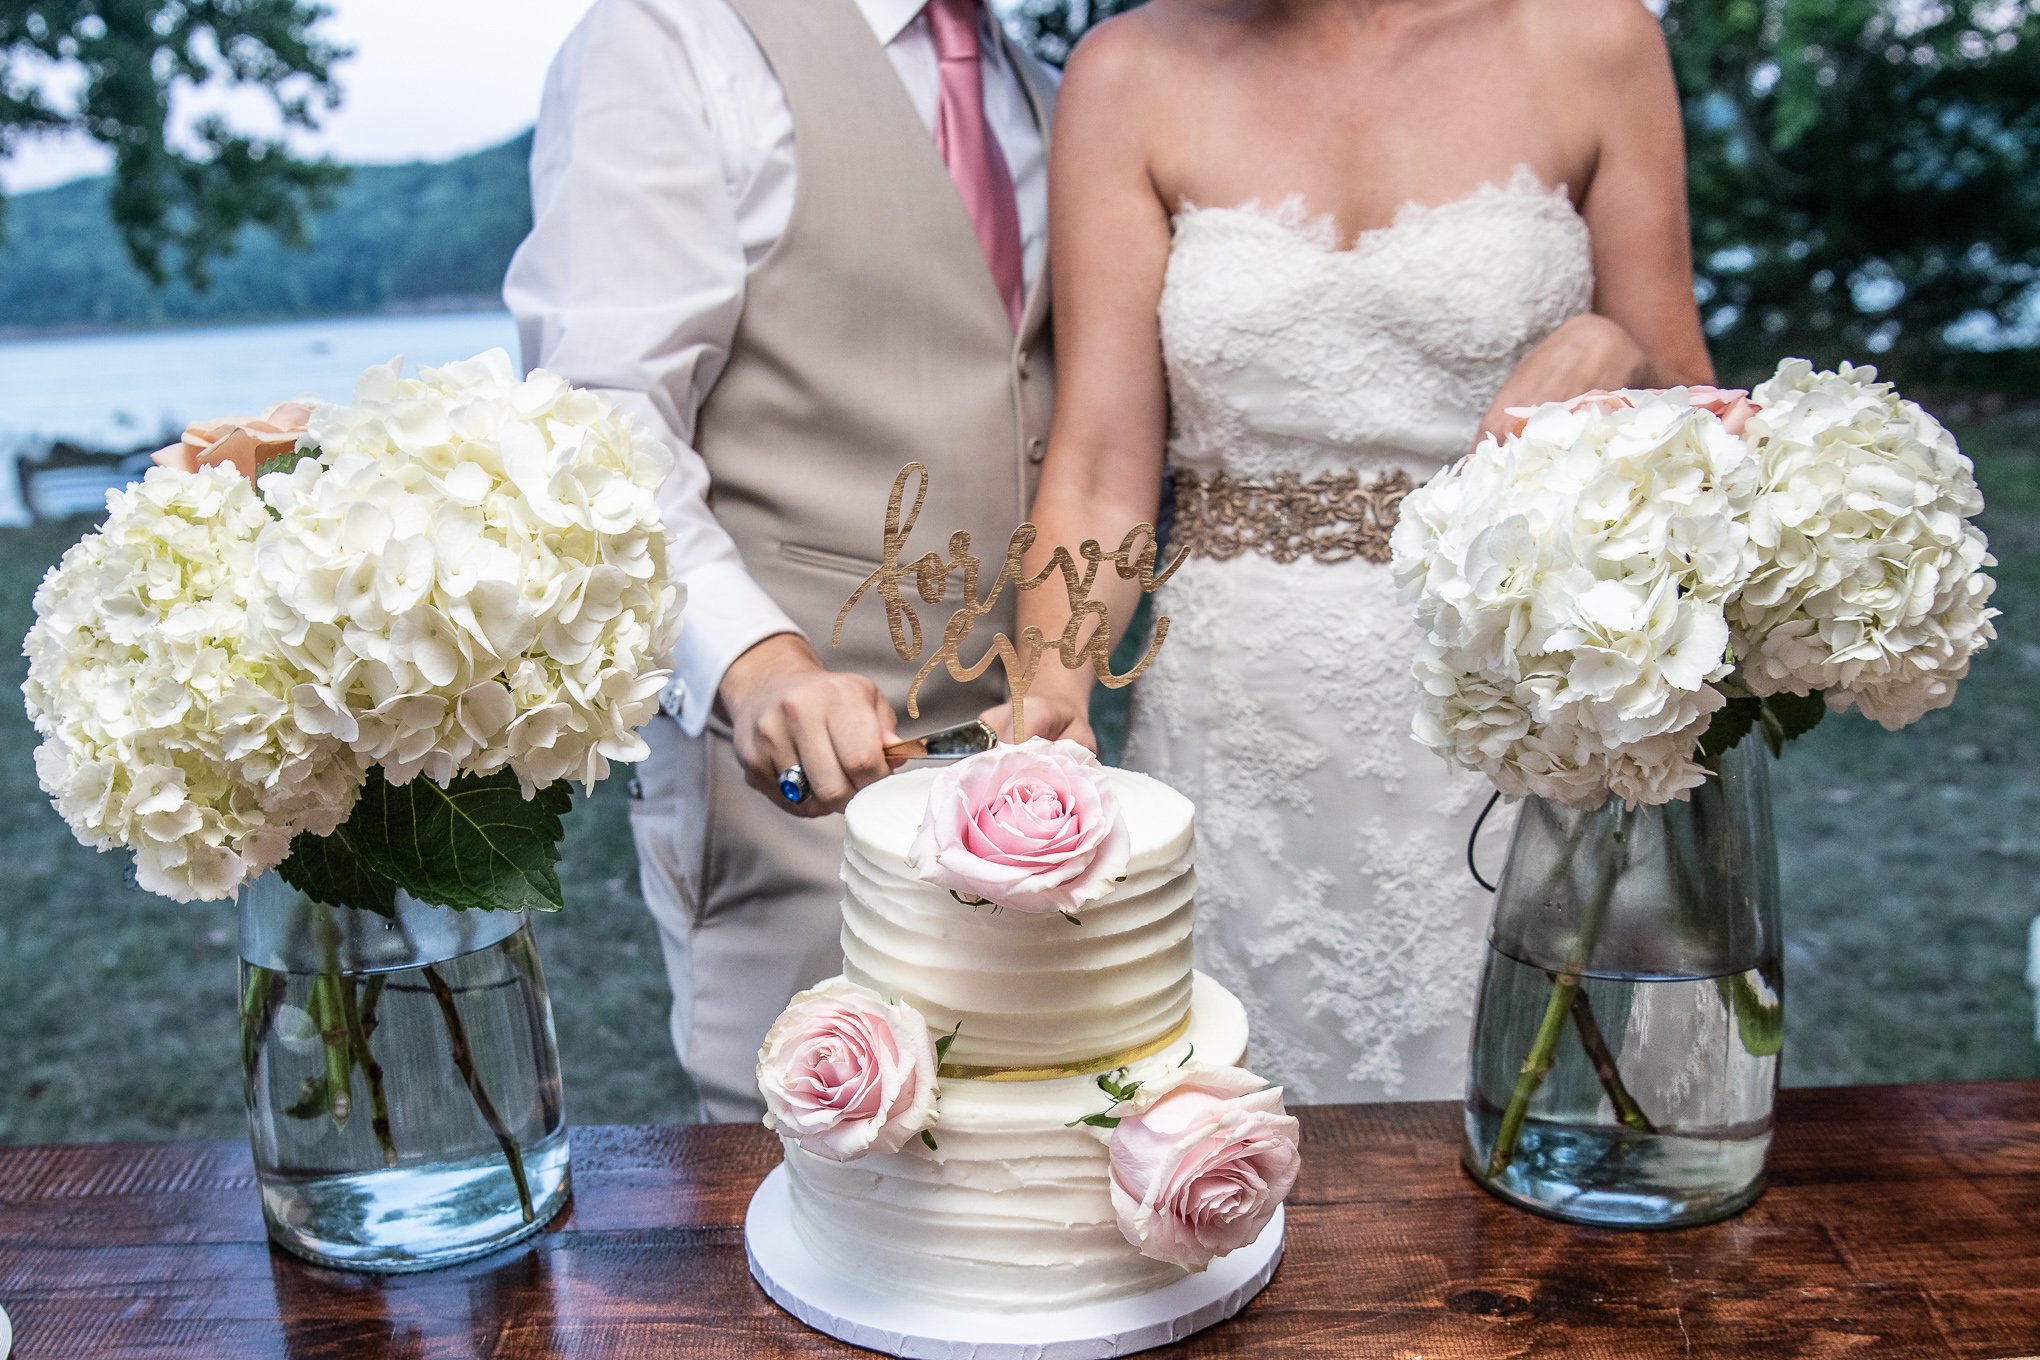 bride and groom cutting their wedding cake